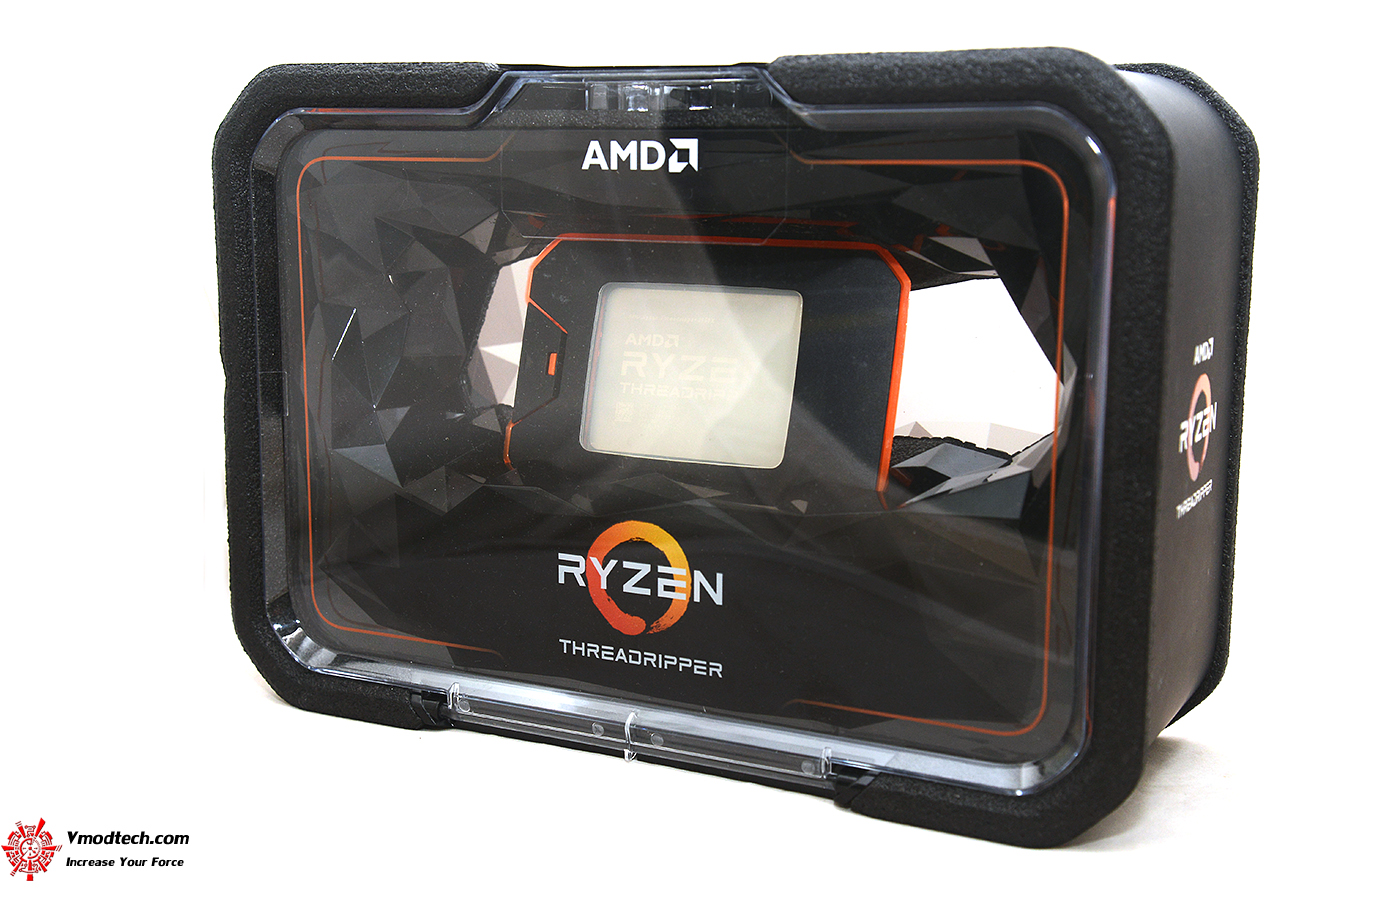 dsc 6505 AMD RYZEN THREADRIPPER 2950X PROCESSOR REVIEW